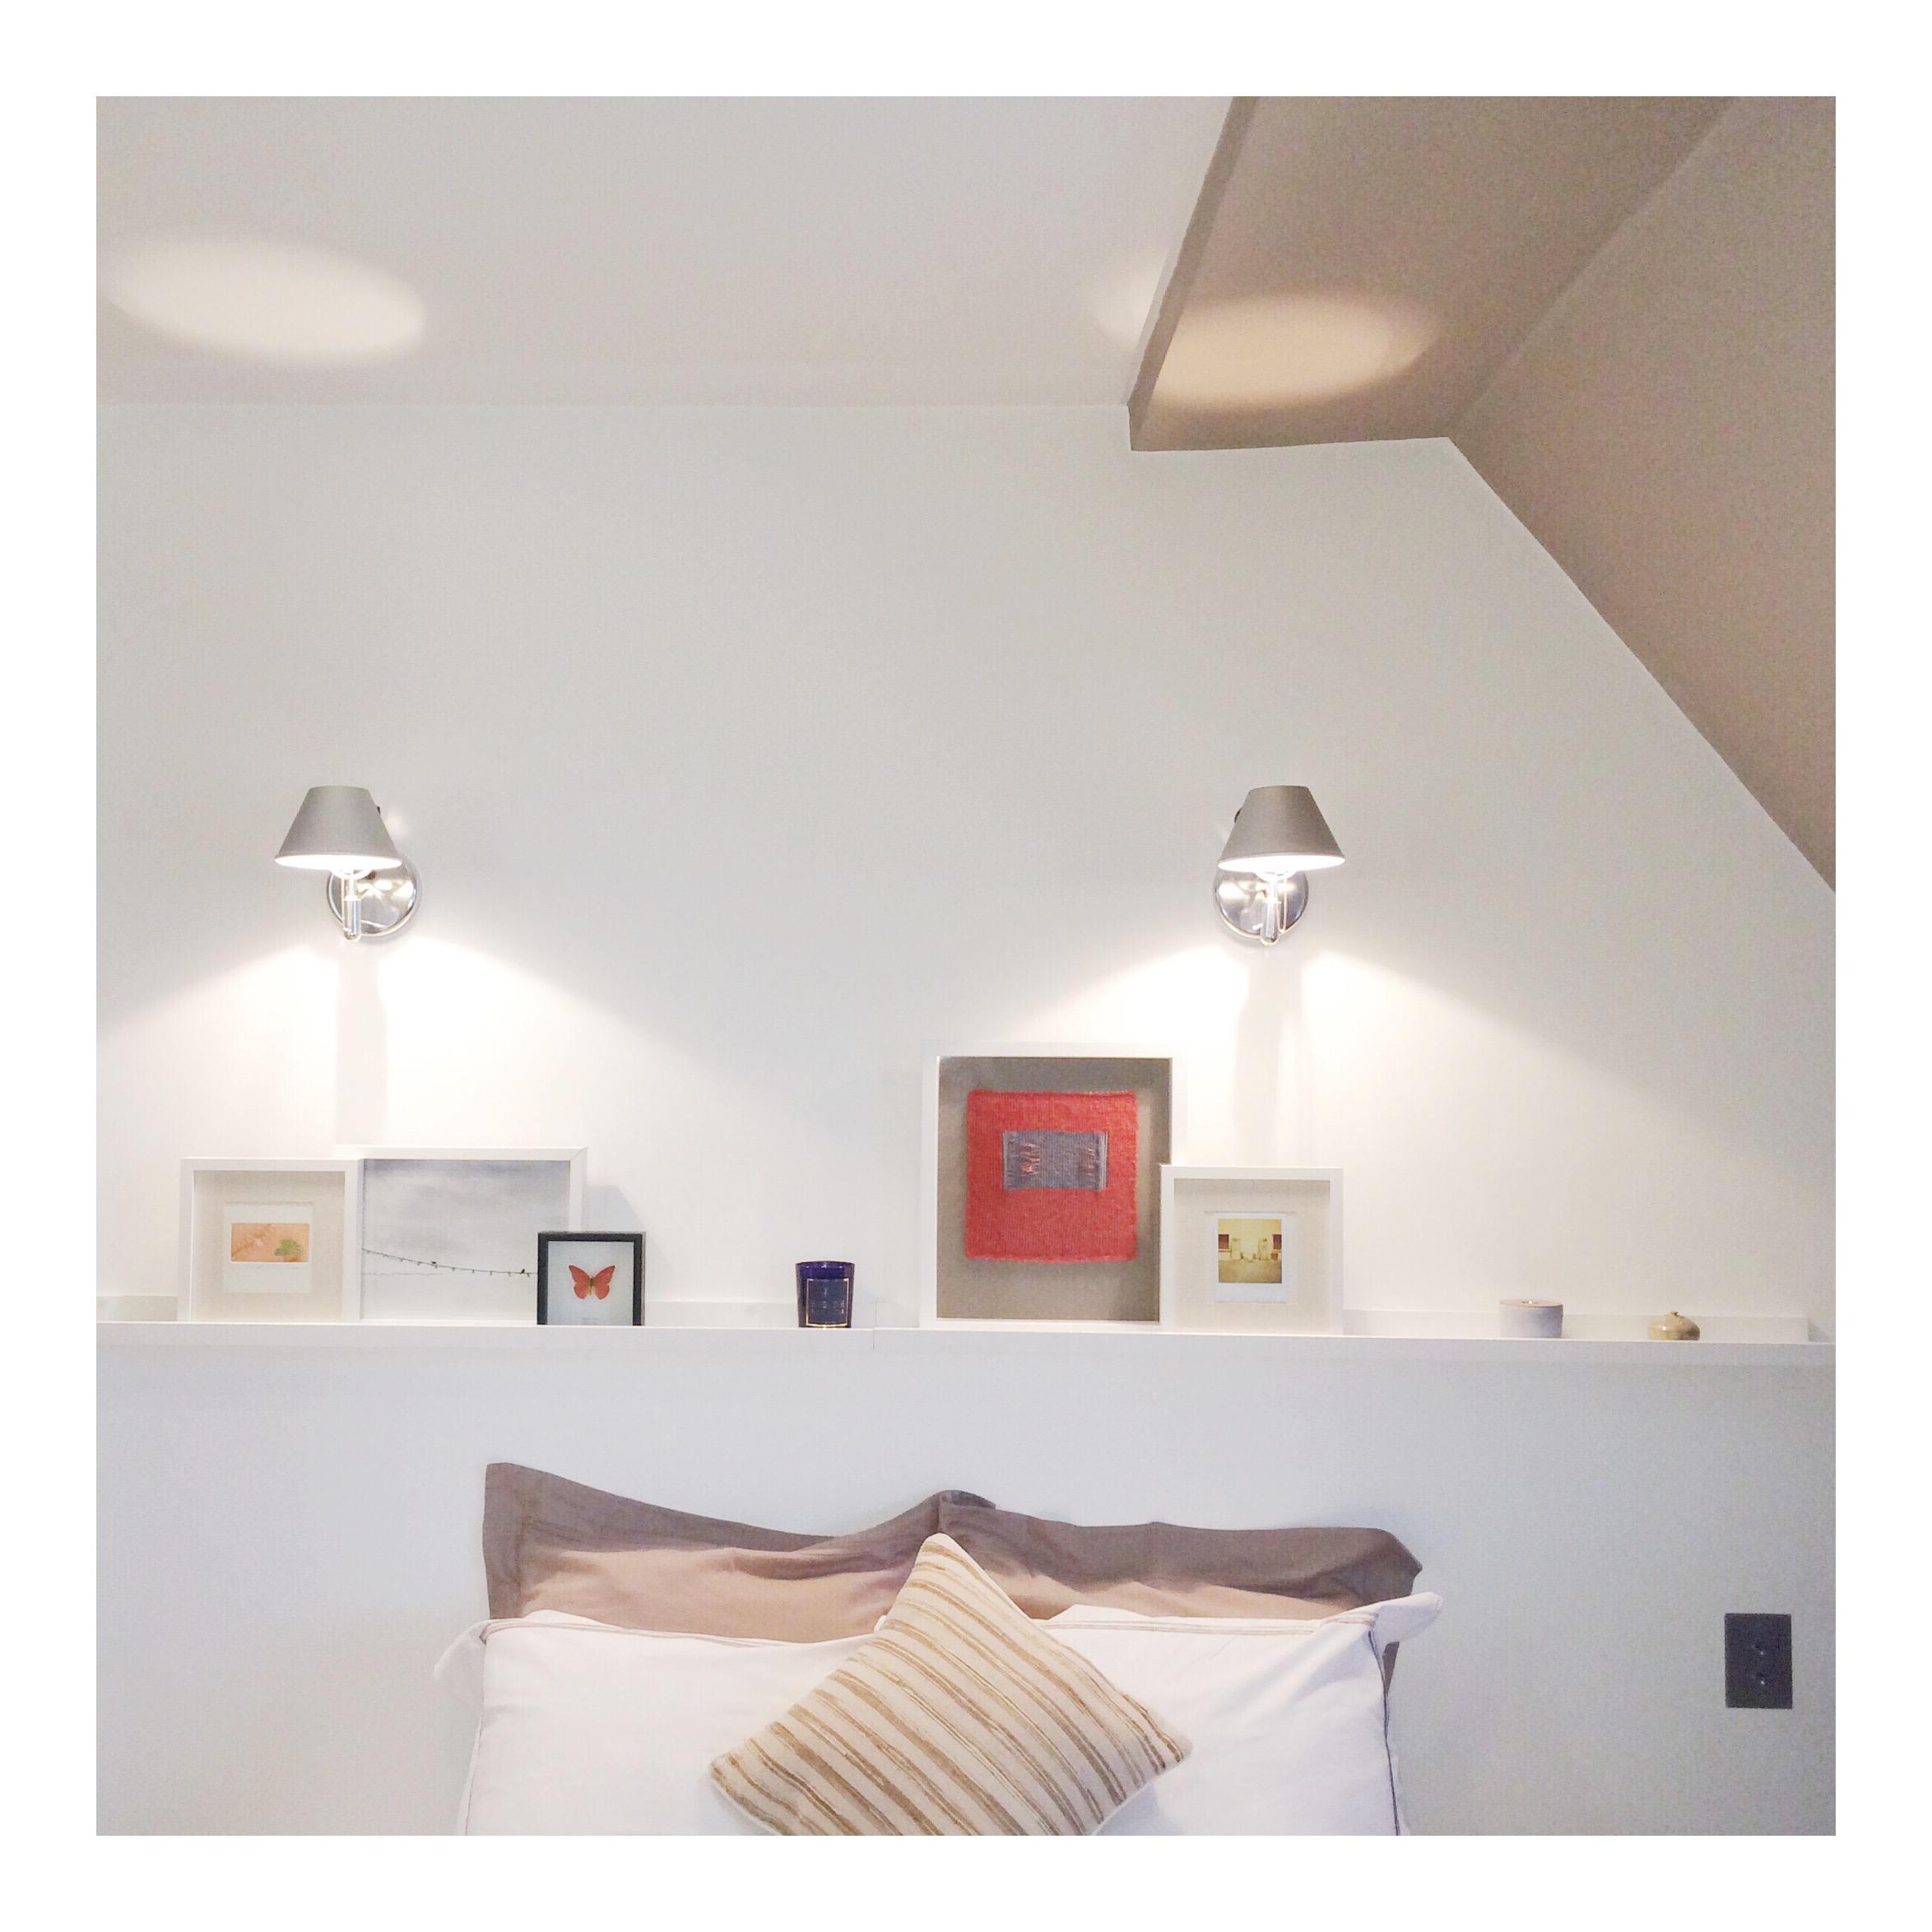 Private home, Paris | series I